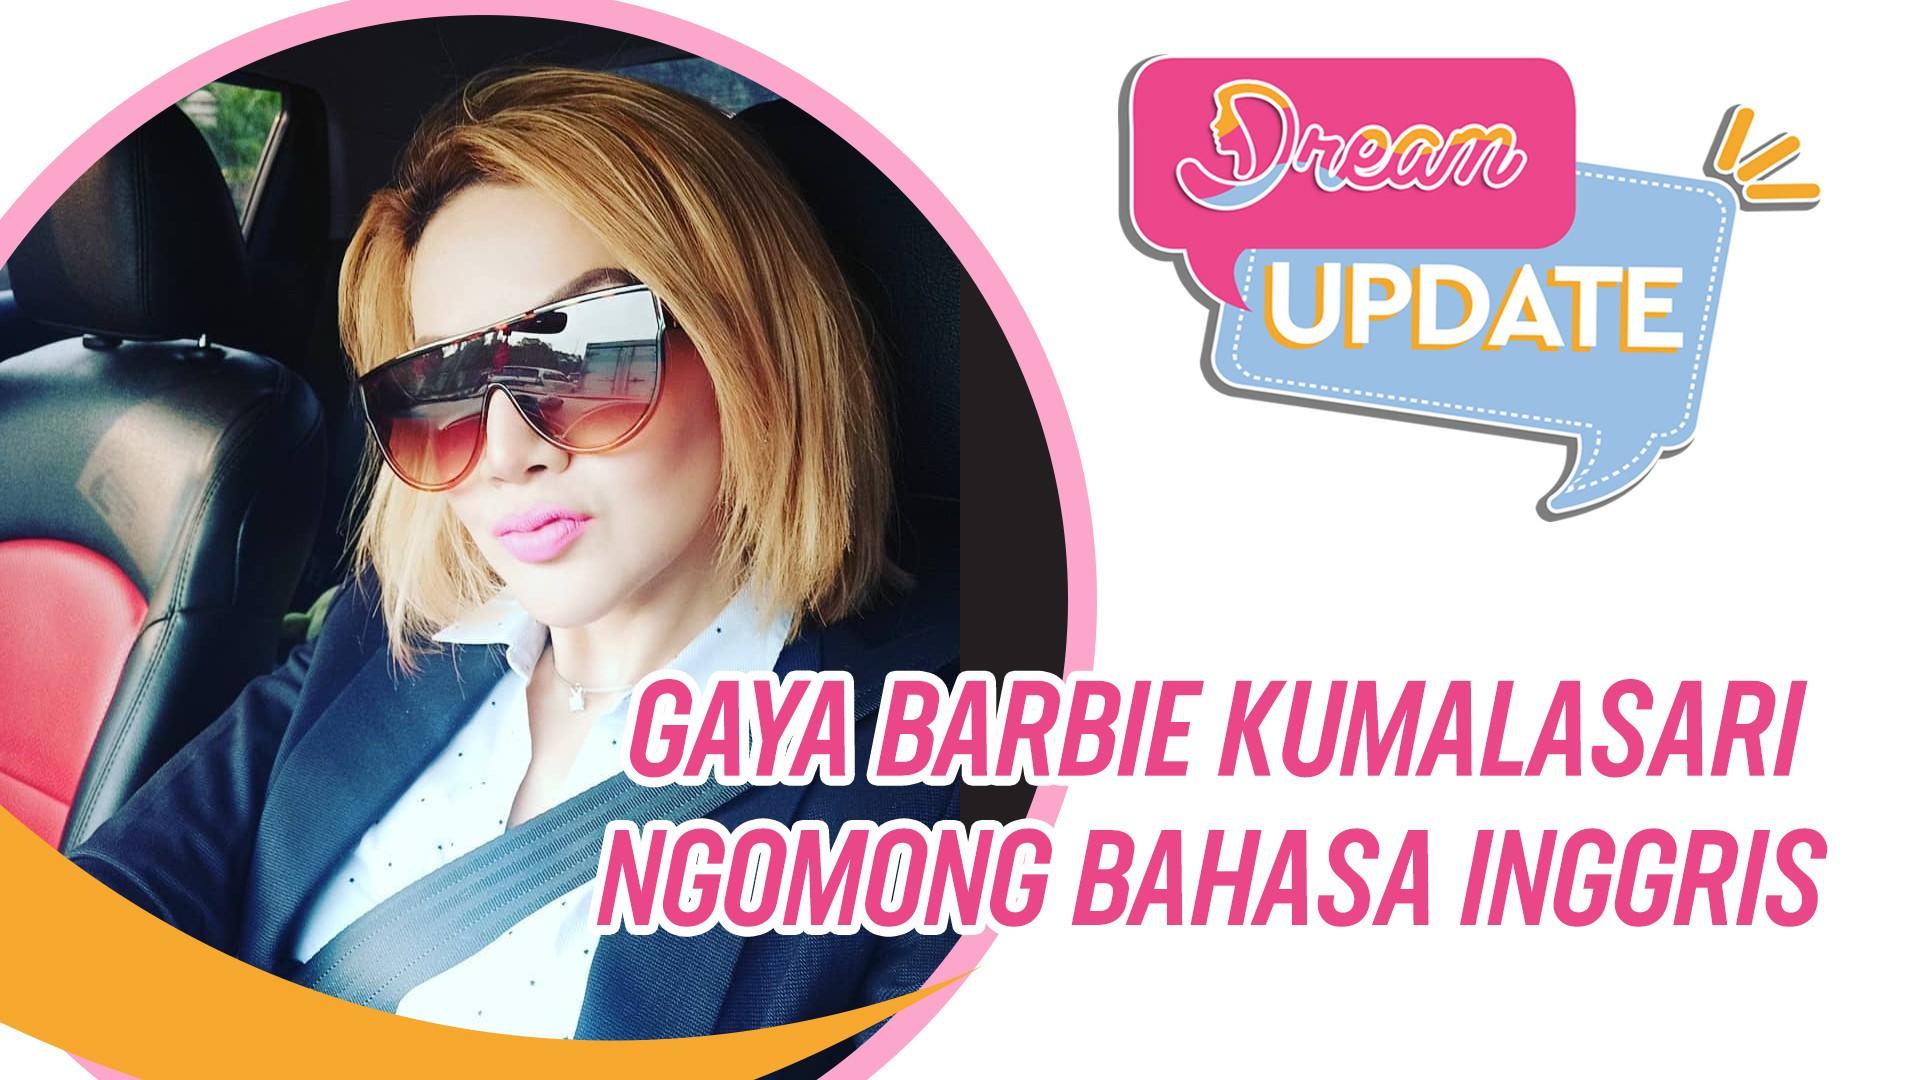 Kocak Abis Gaya Barbie Kumalasari Ngomong Bahasa Inggris